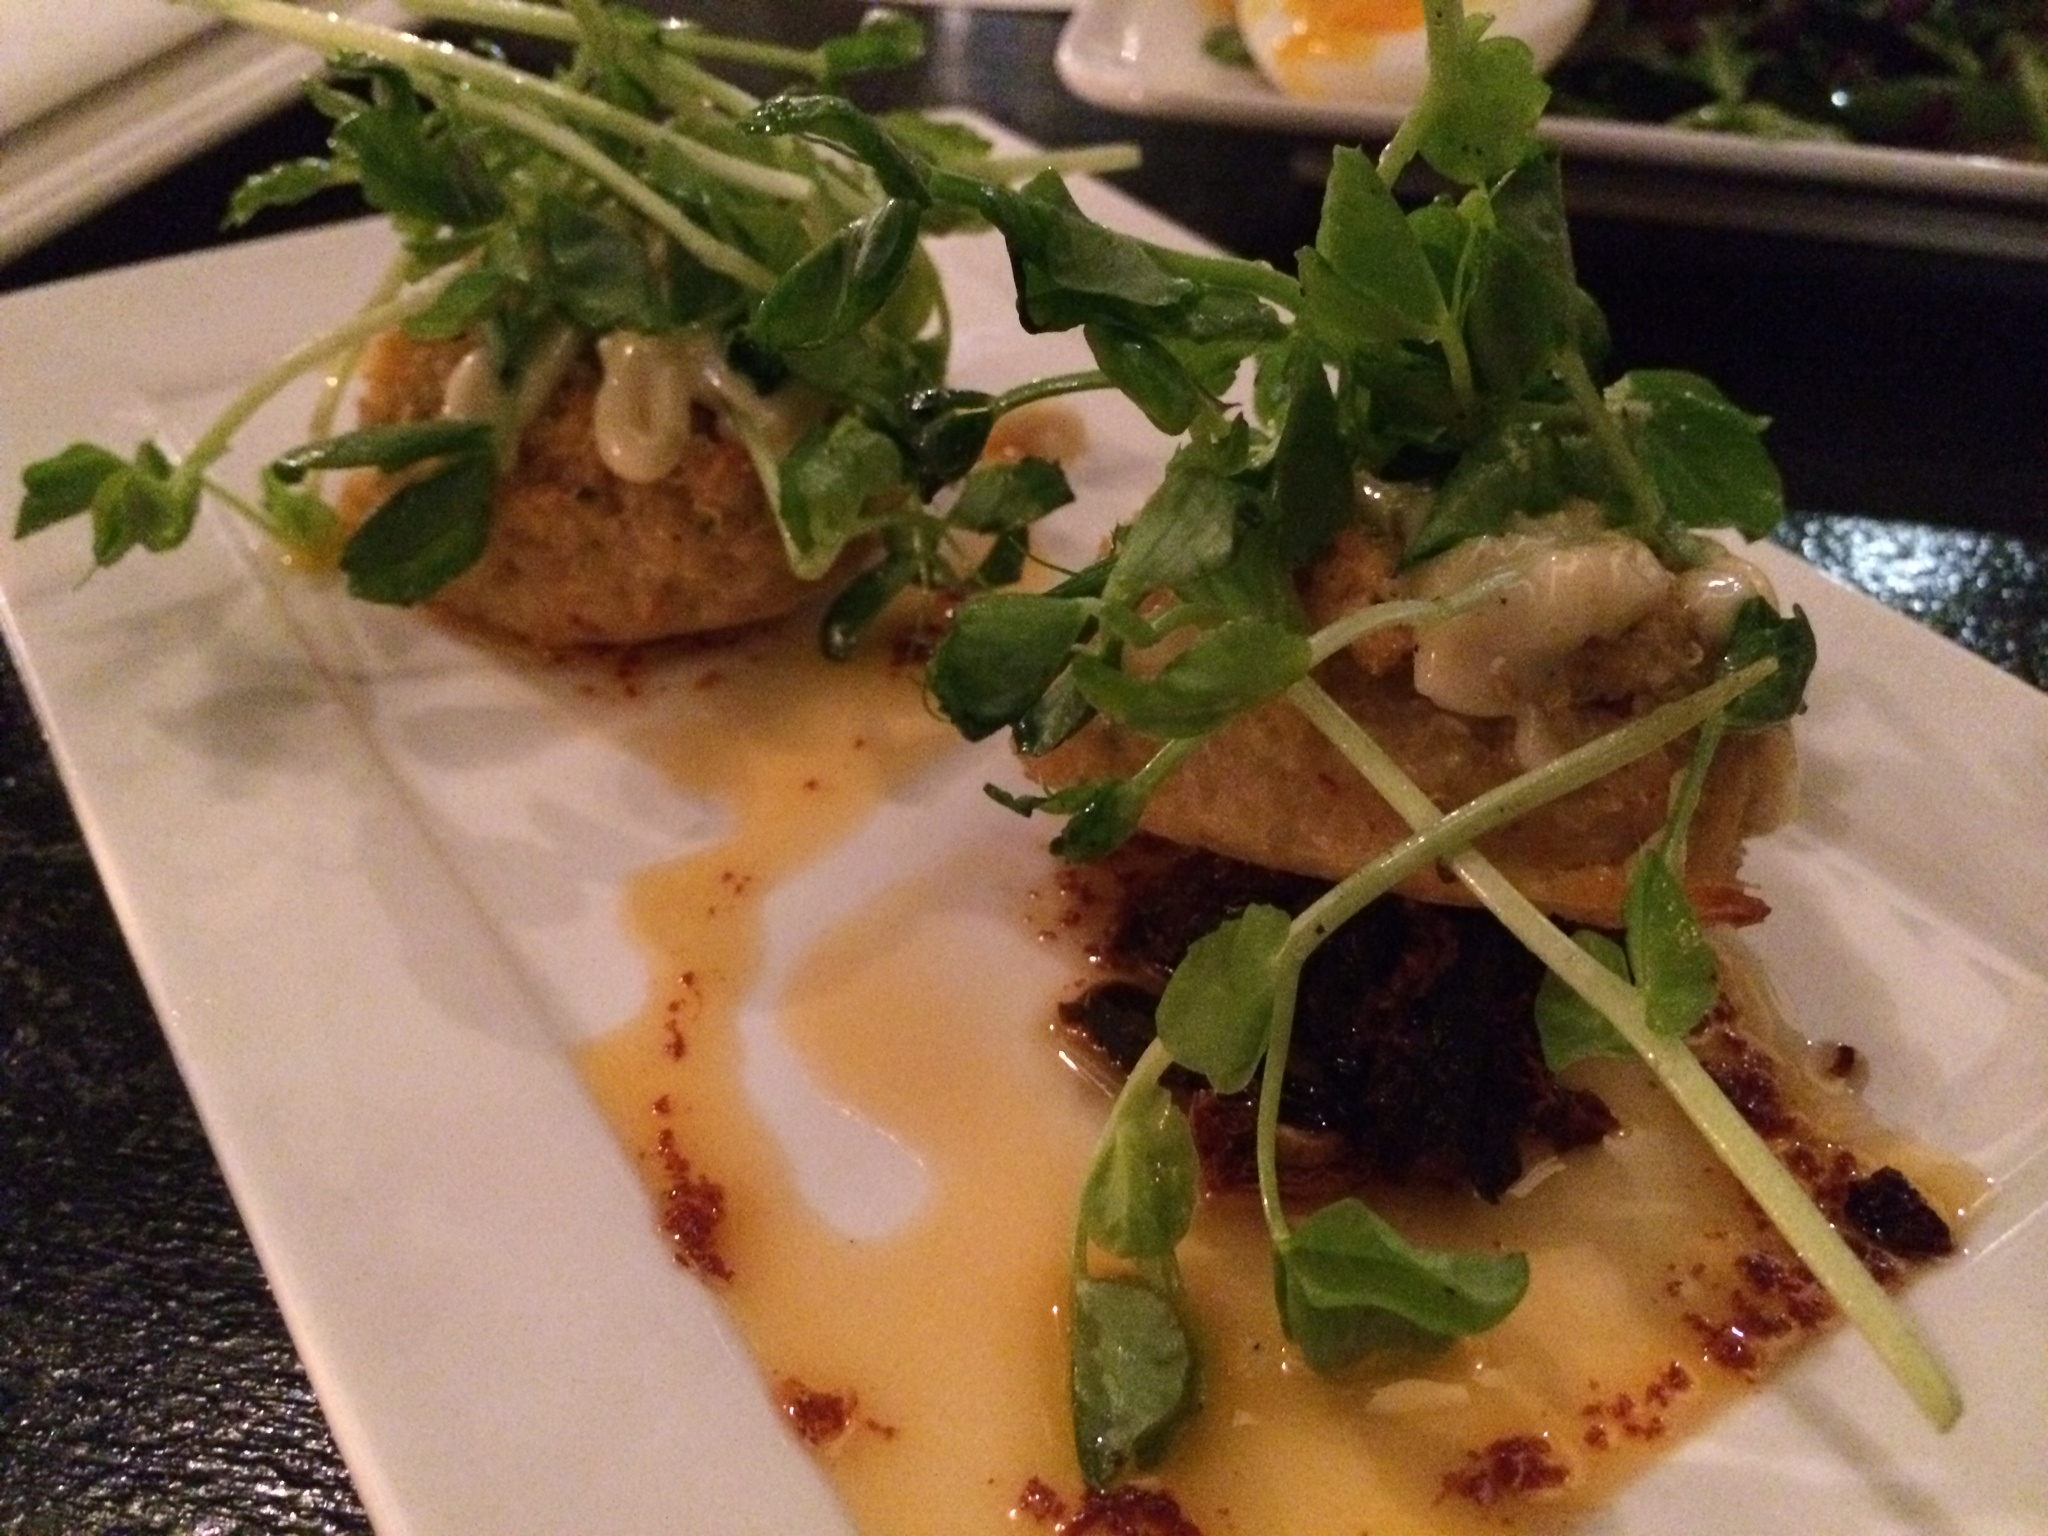 Burgundy Restaurant - Crab Cakes